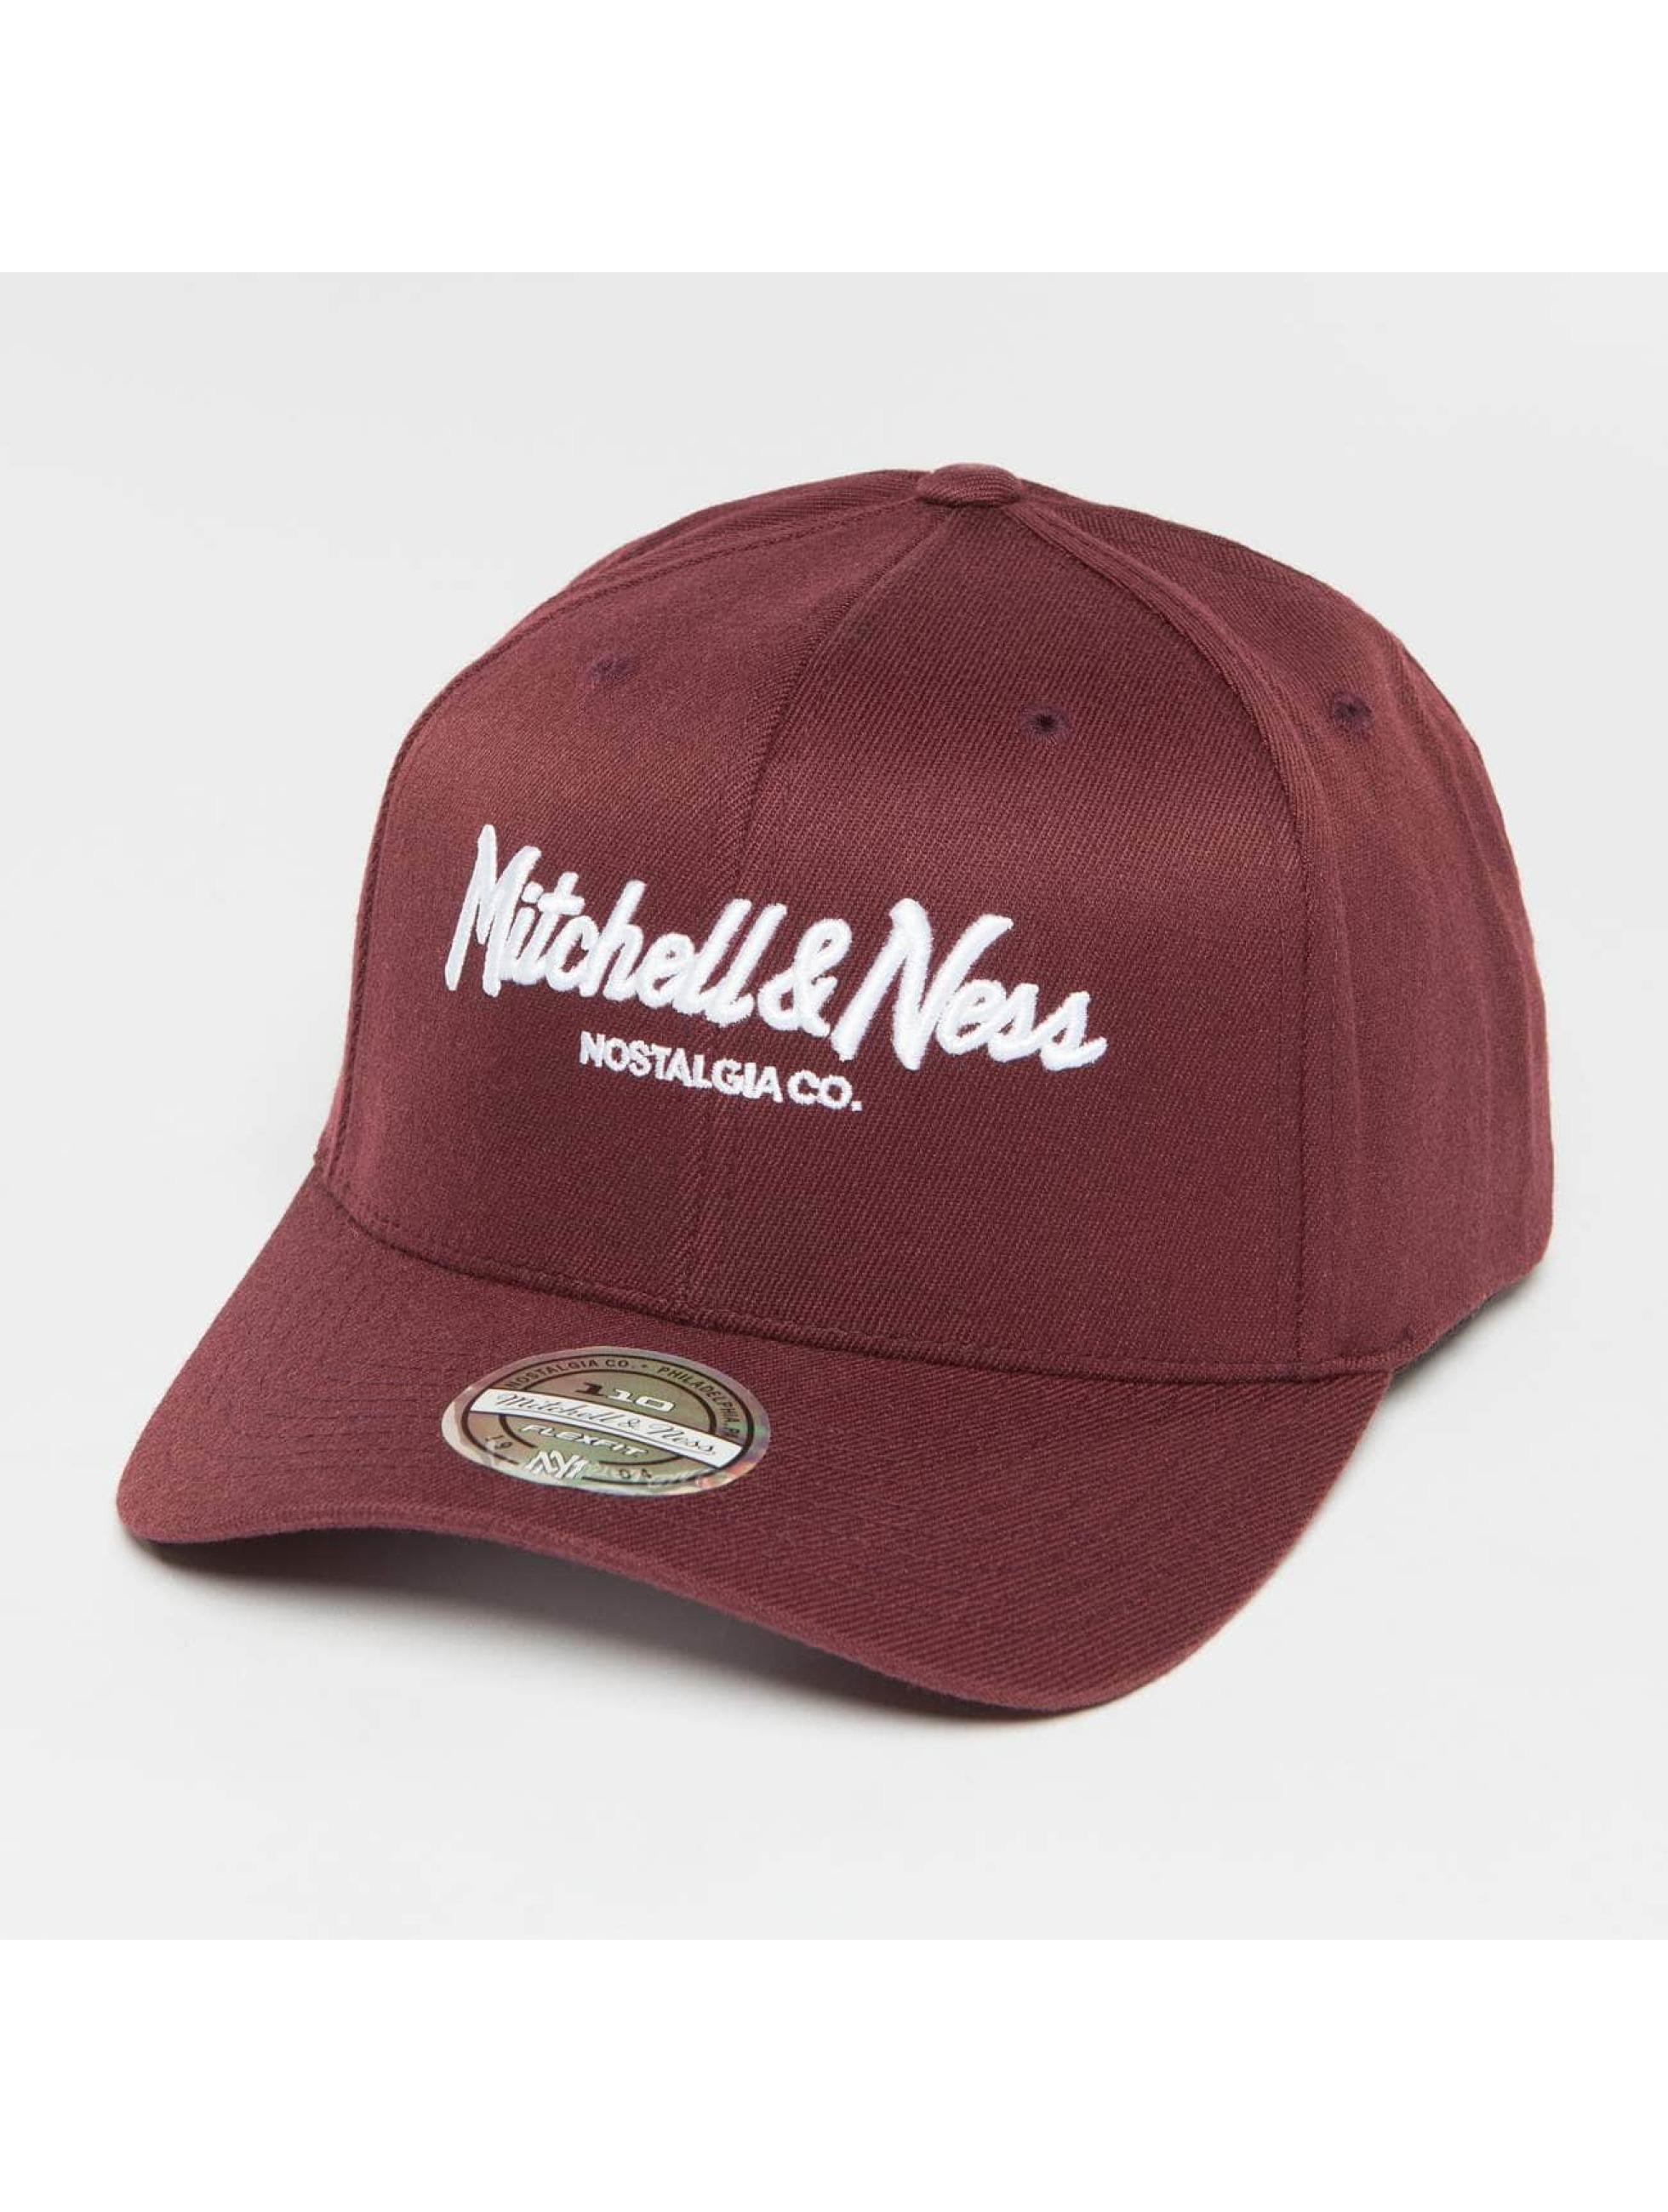 Mitchell & Ness Gorra Snapback Own Brand Pinscript High Crown 110 rojo